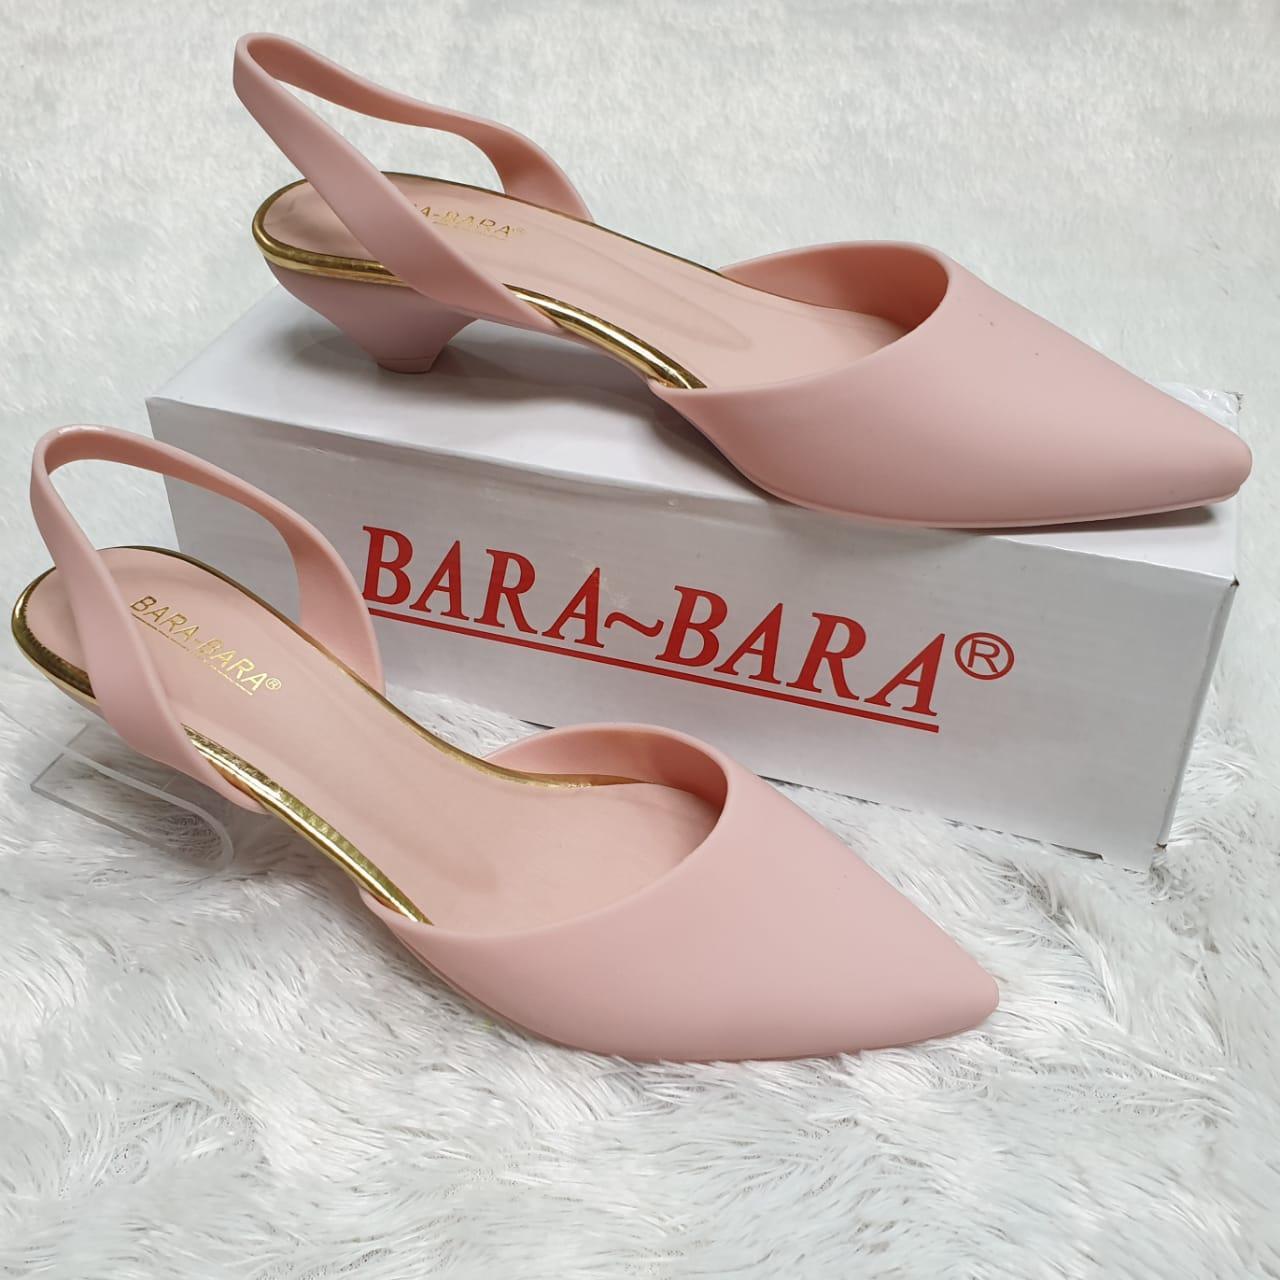 Bara ~ Bara - Jelly Shoes - Flat Shoes Wanita Hak 3 cm STR13A Warna Dikirim